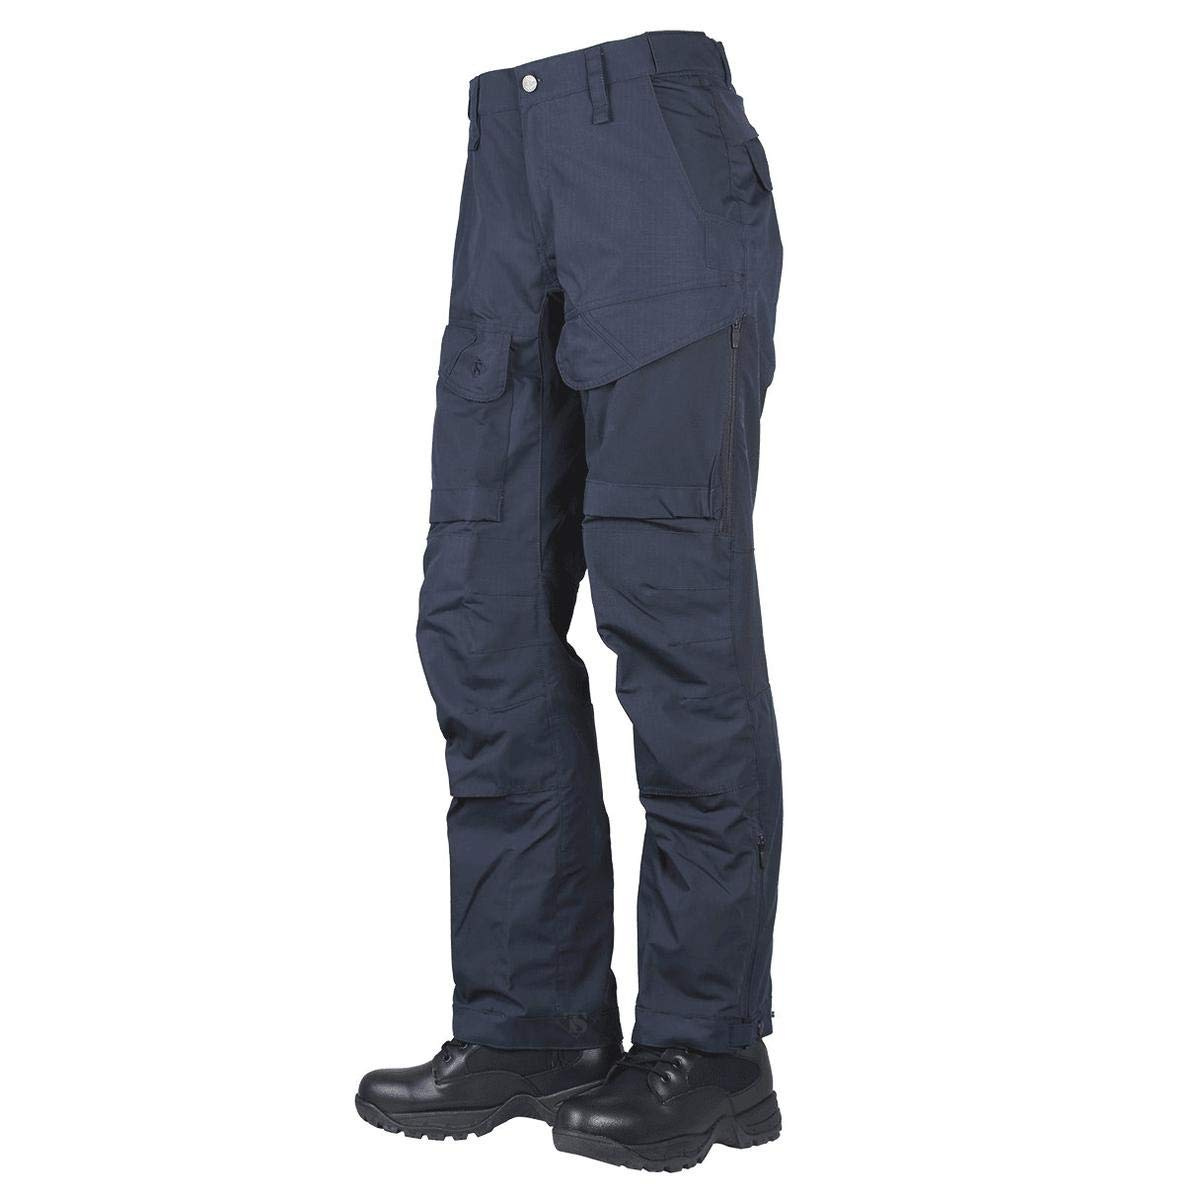 TRU-SPEC Men's 24-7 Series Xpedition Pant, Navy, 32 W x 32 L